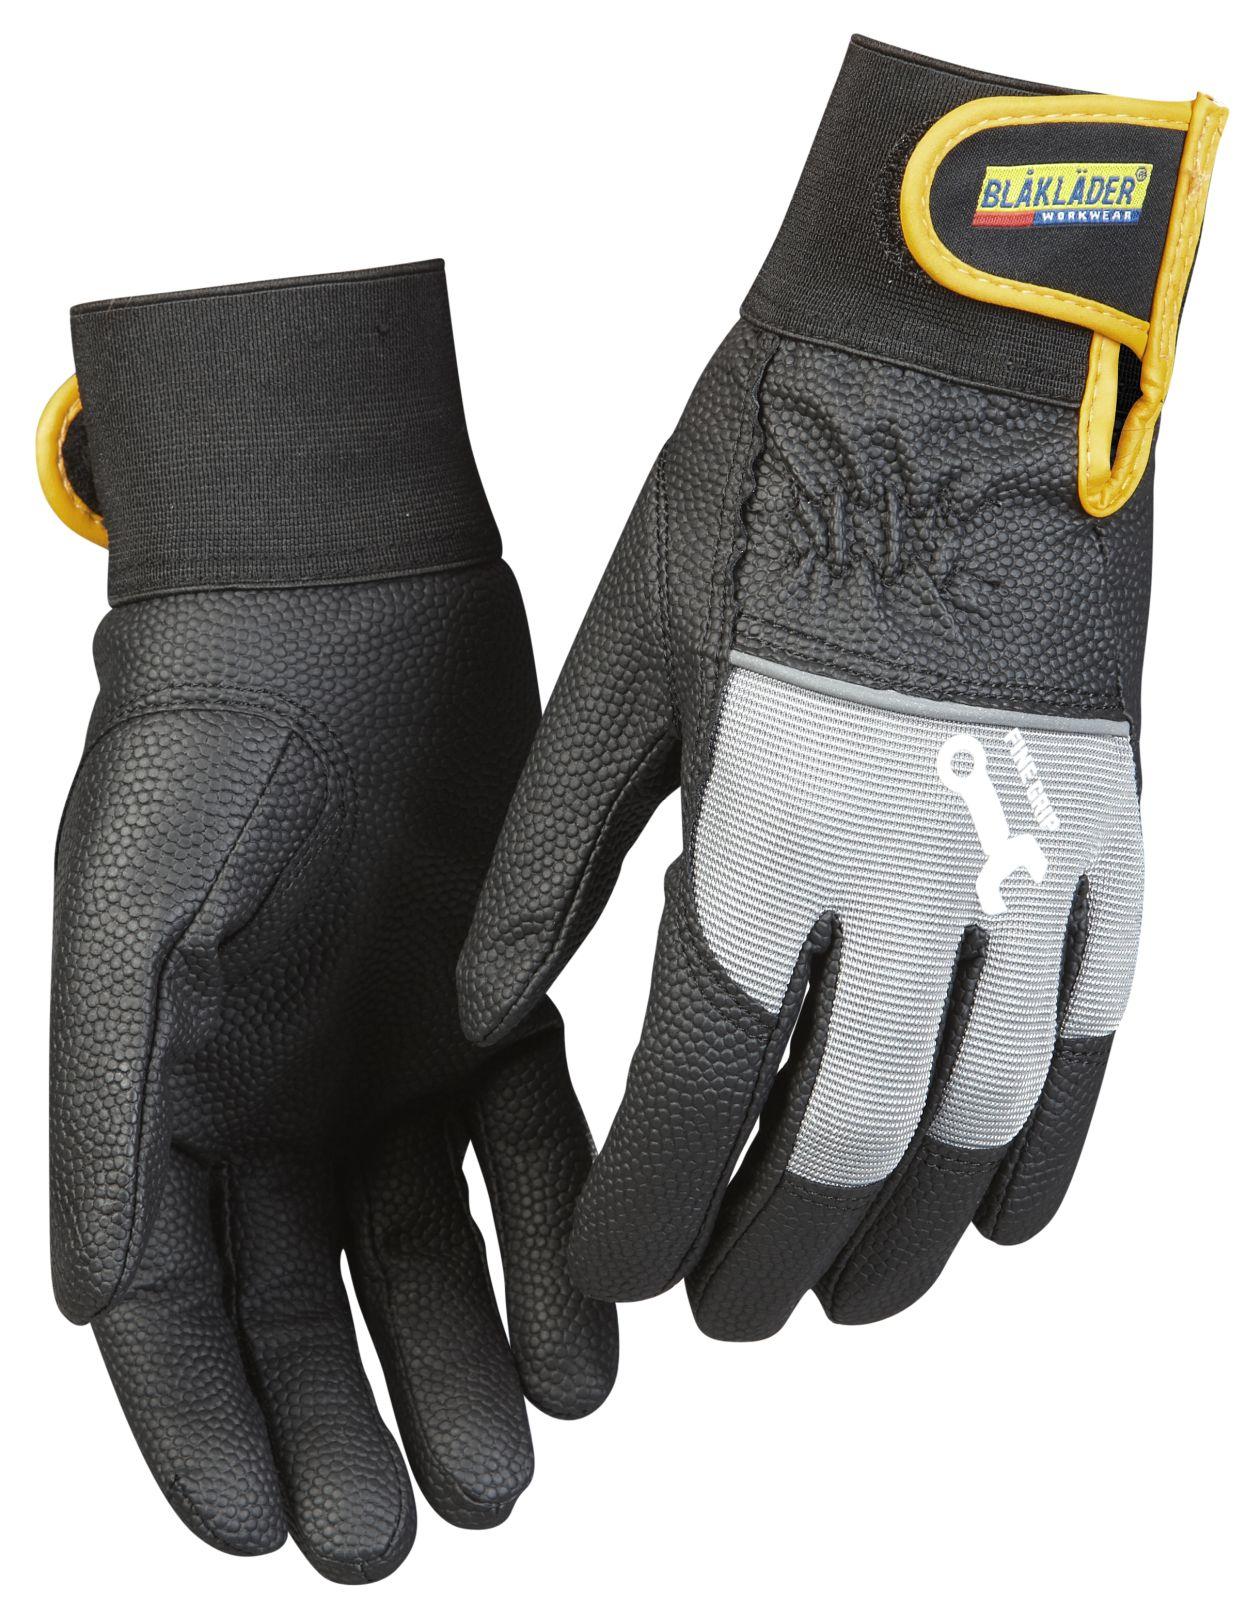 Blaklader Werkhandschoenen 22453942 zwart-grijs(9994)